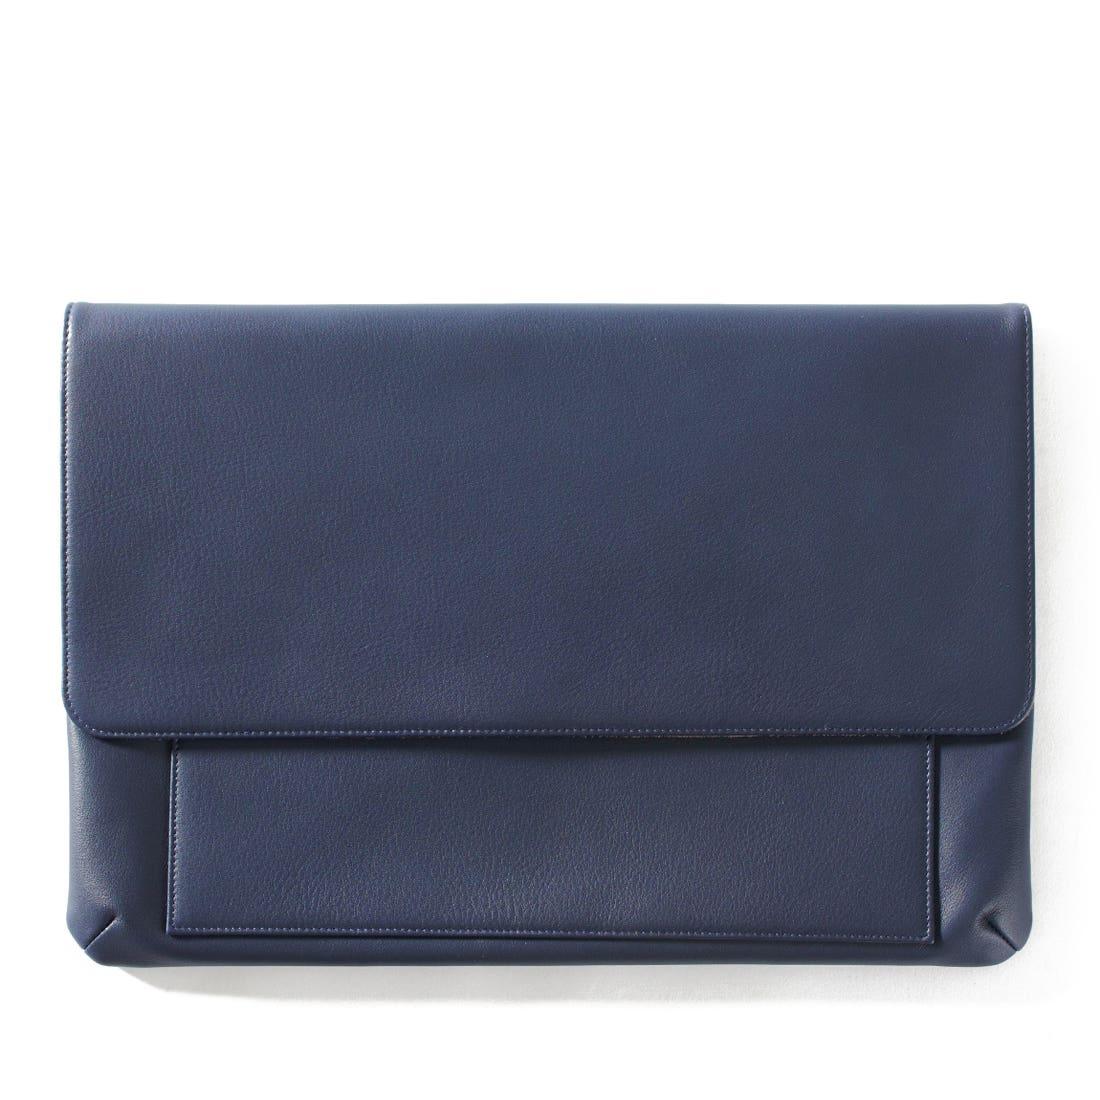 Laptop Clutch